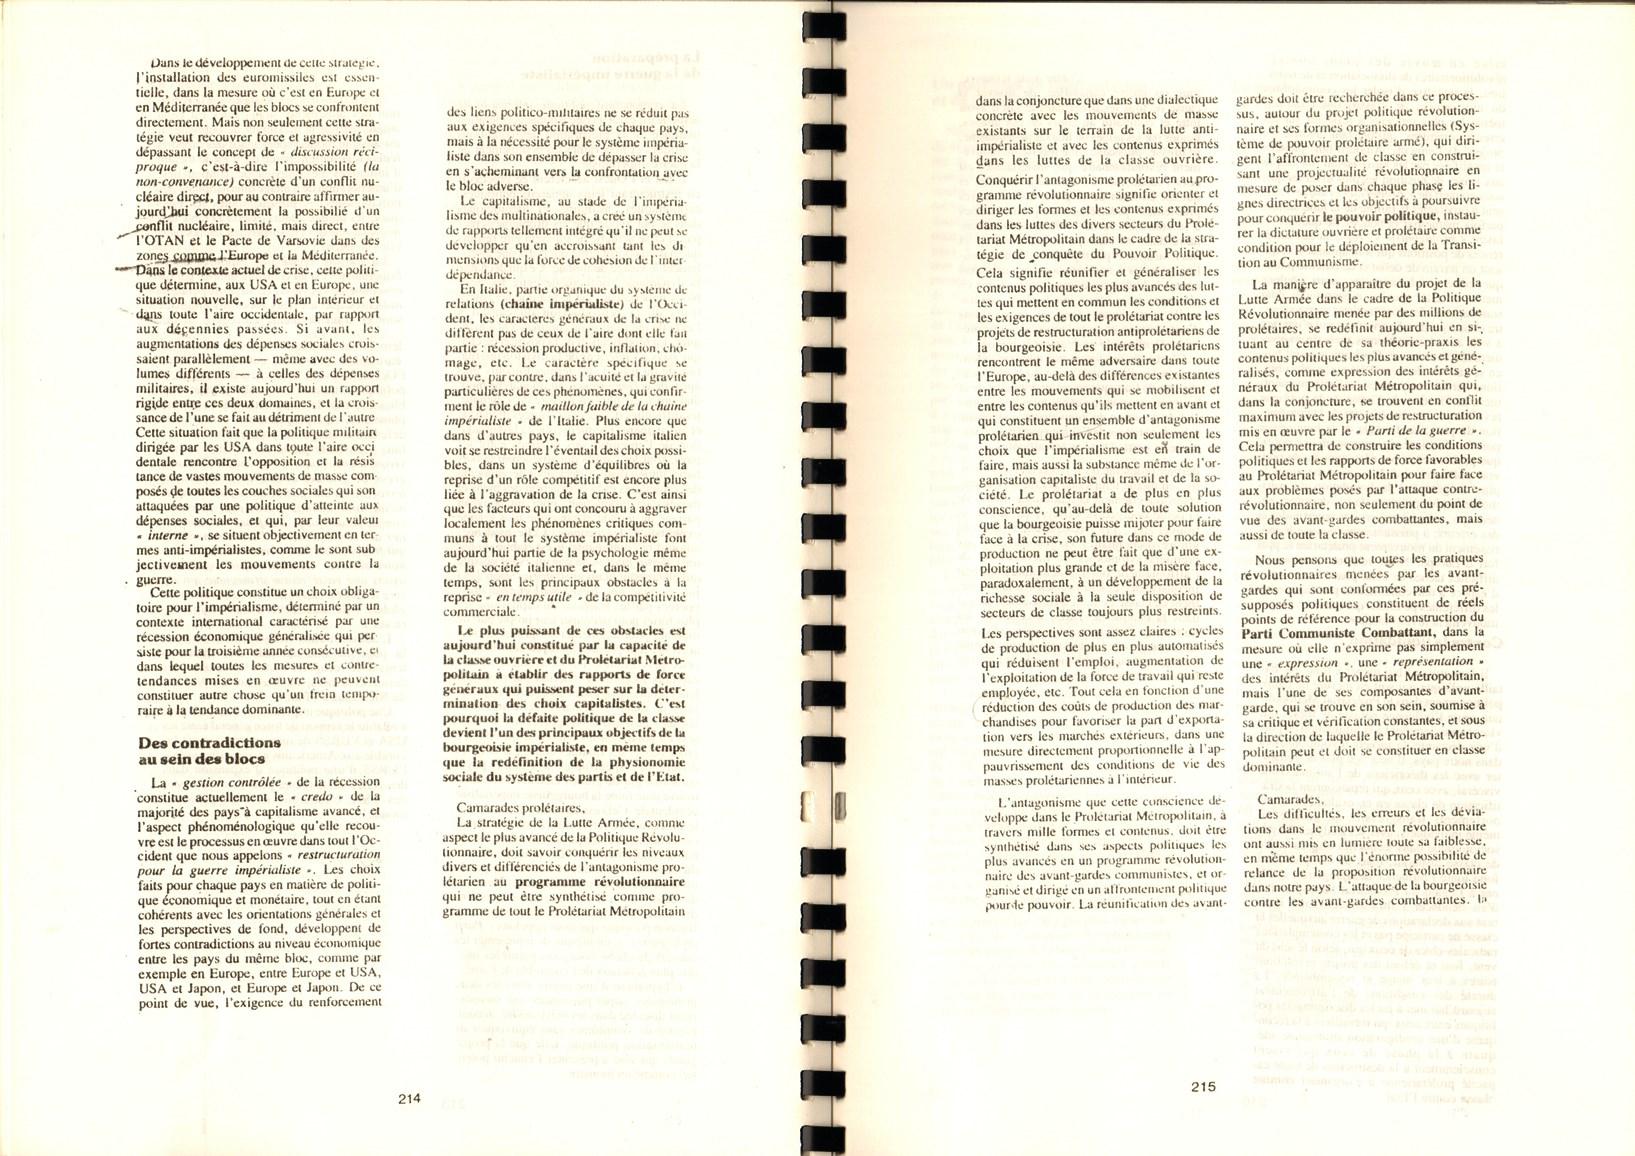 Internationale_Debatte_1985_Brigate_Rosse_108